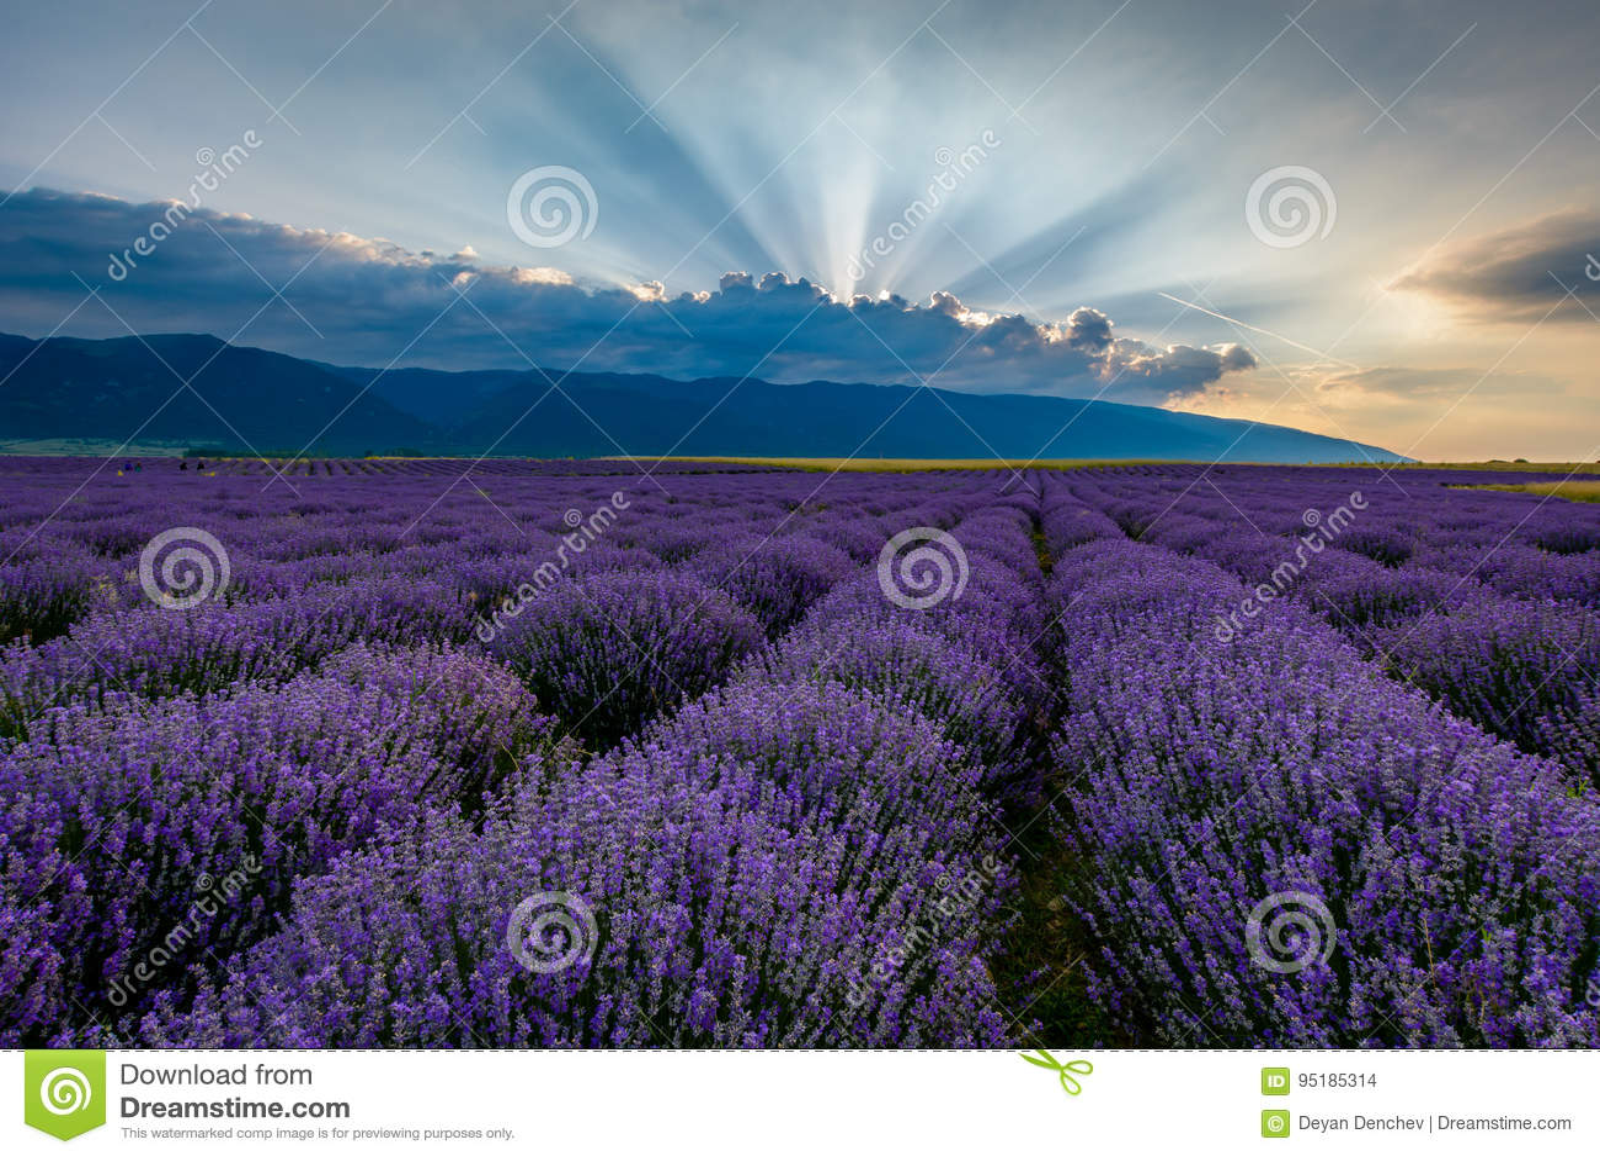 Lavender field at sunrise in Bulgaria